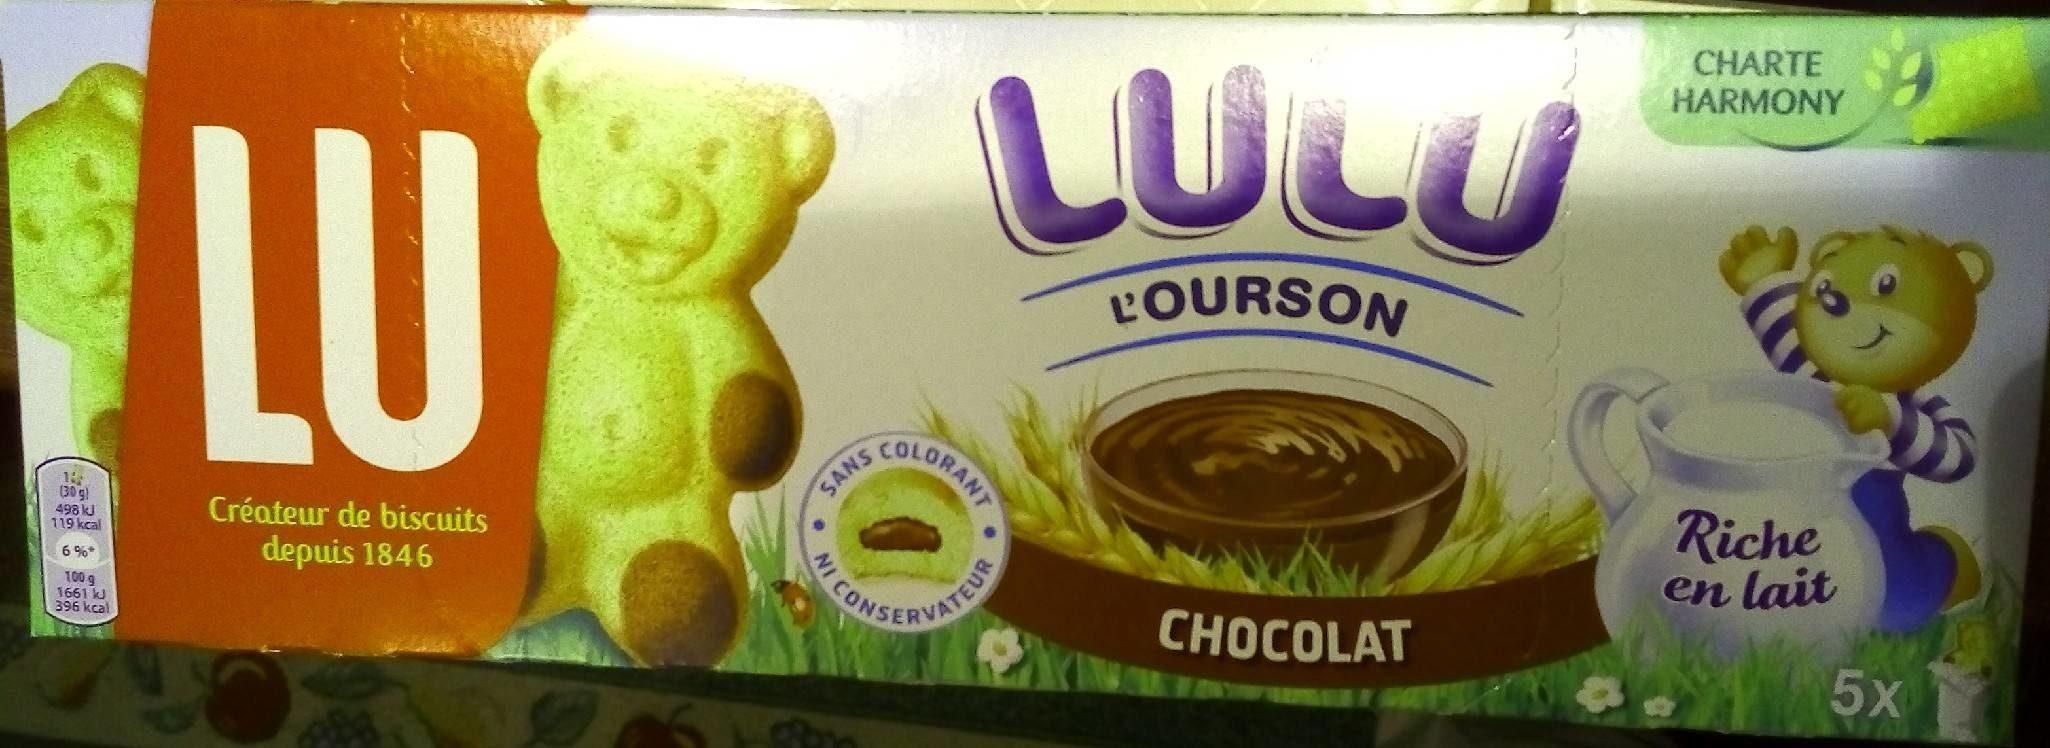 Lulu L'Ourson Chocolat - Produit - fr